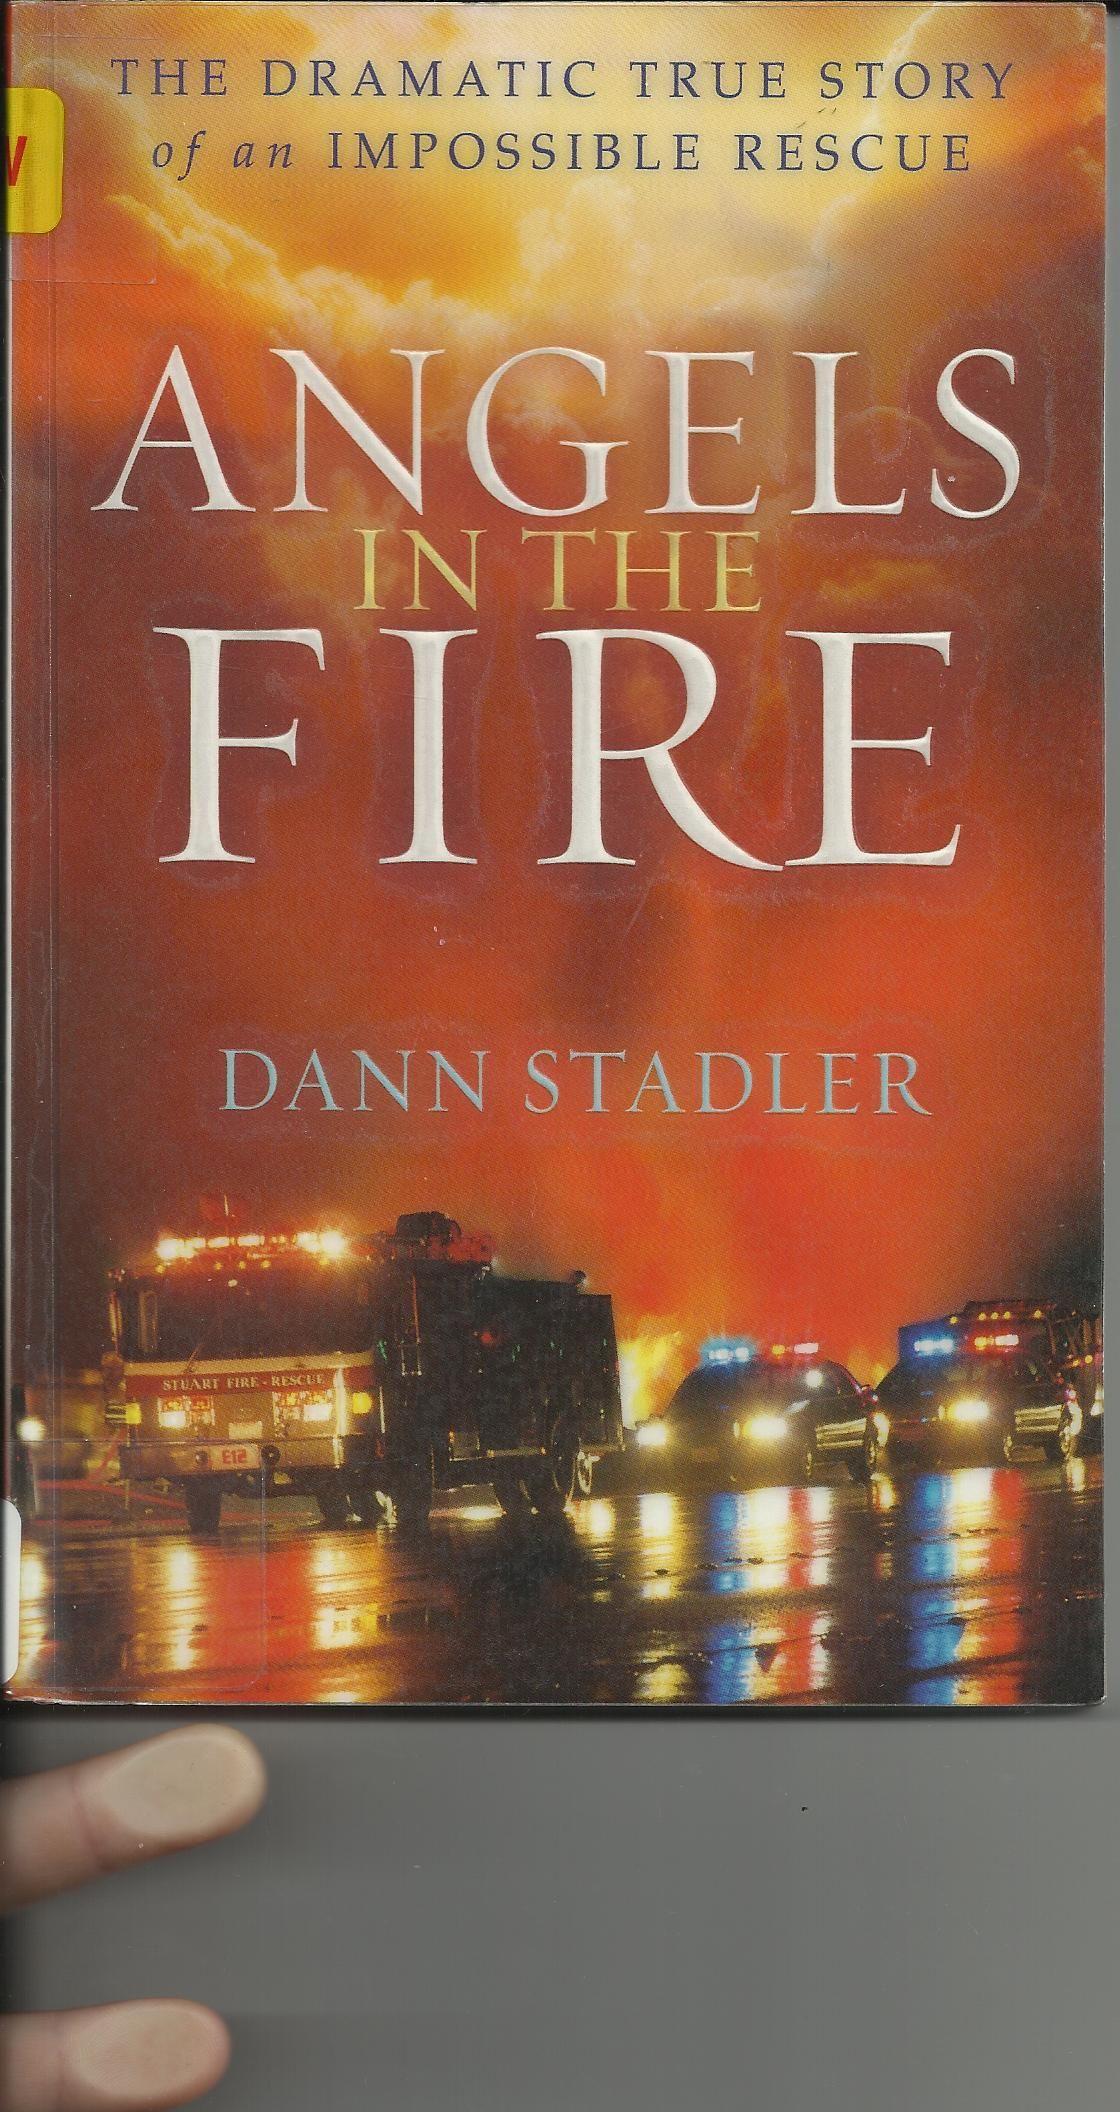 Angels in the Fire - Book by Dann Stadler - News - Bubblews